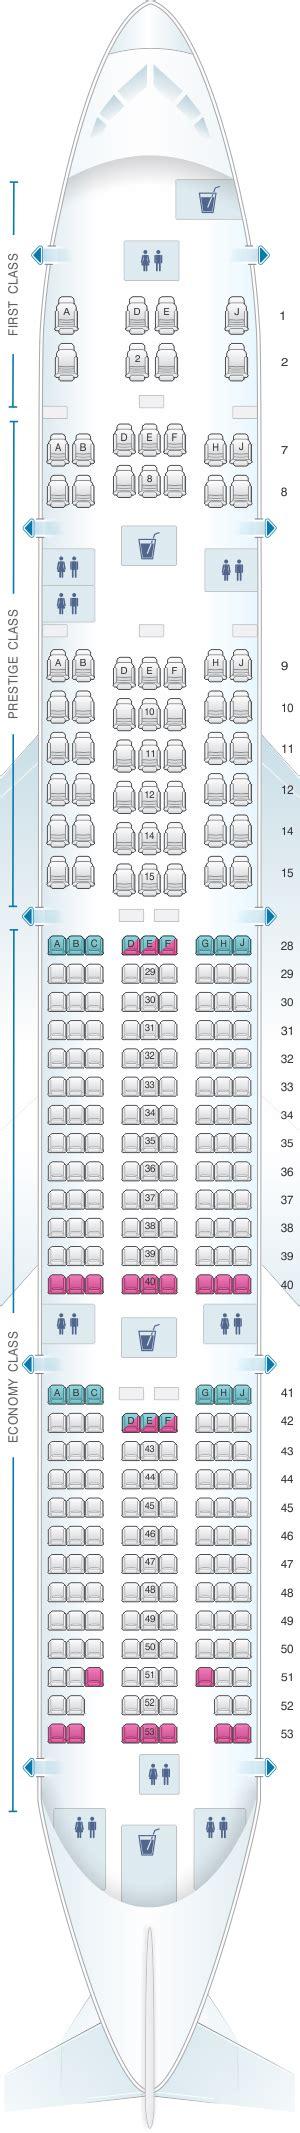 plan si es boeing 777 300er air seat map air boeing b777 300er 291pax seatmaestro